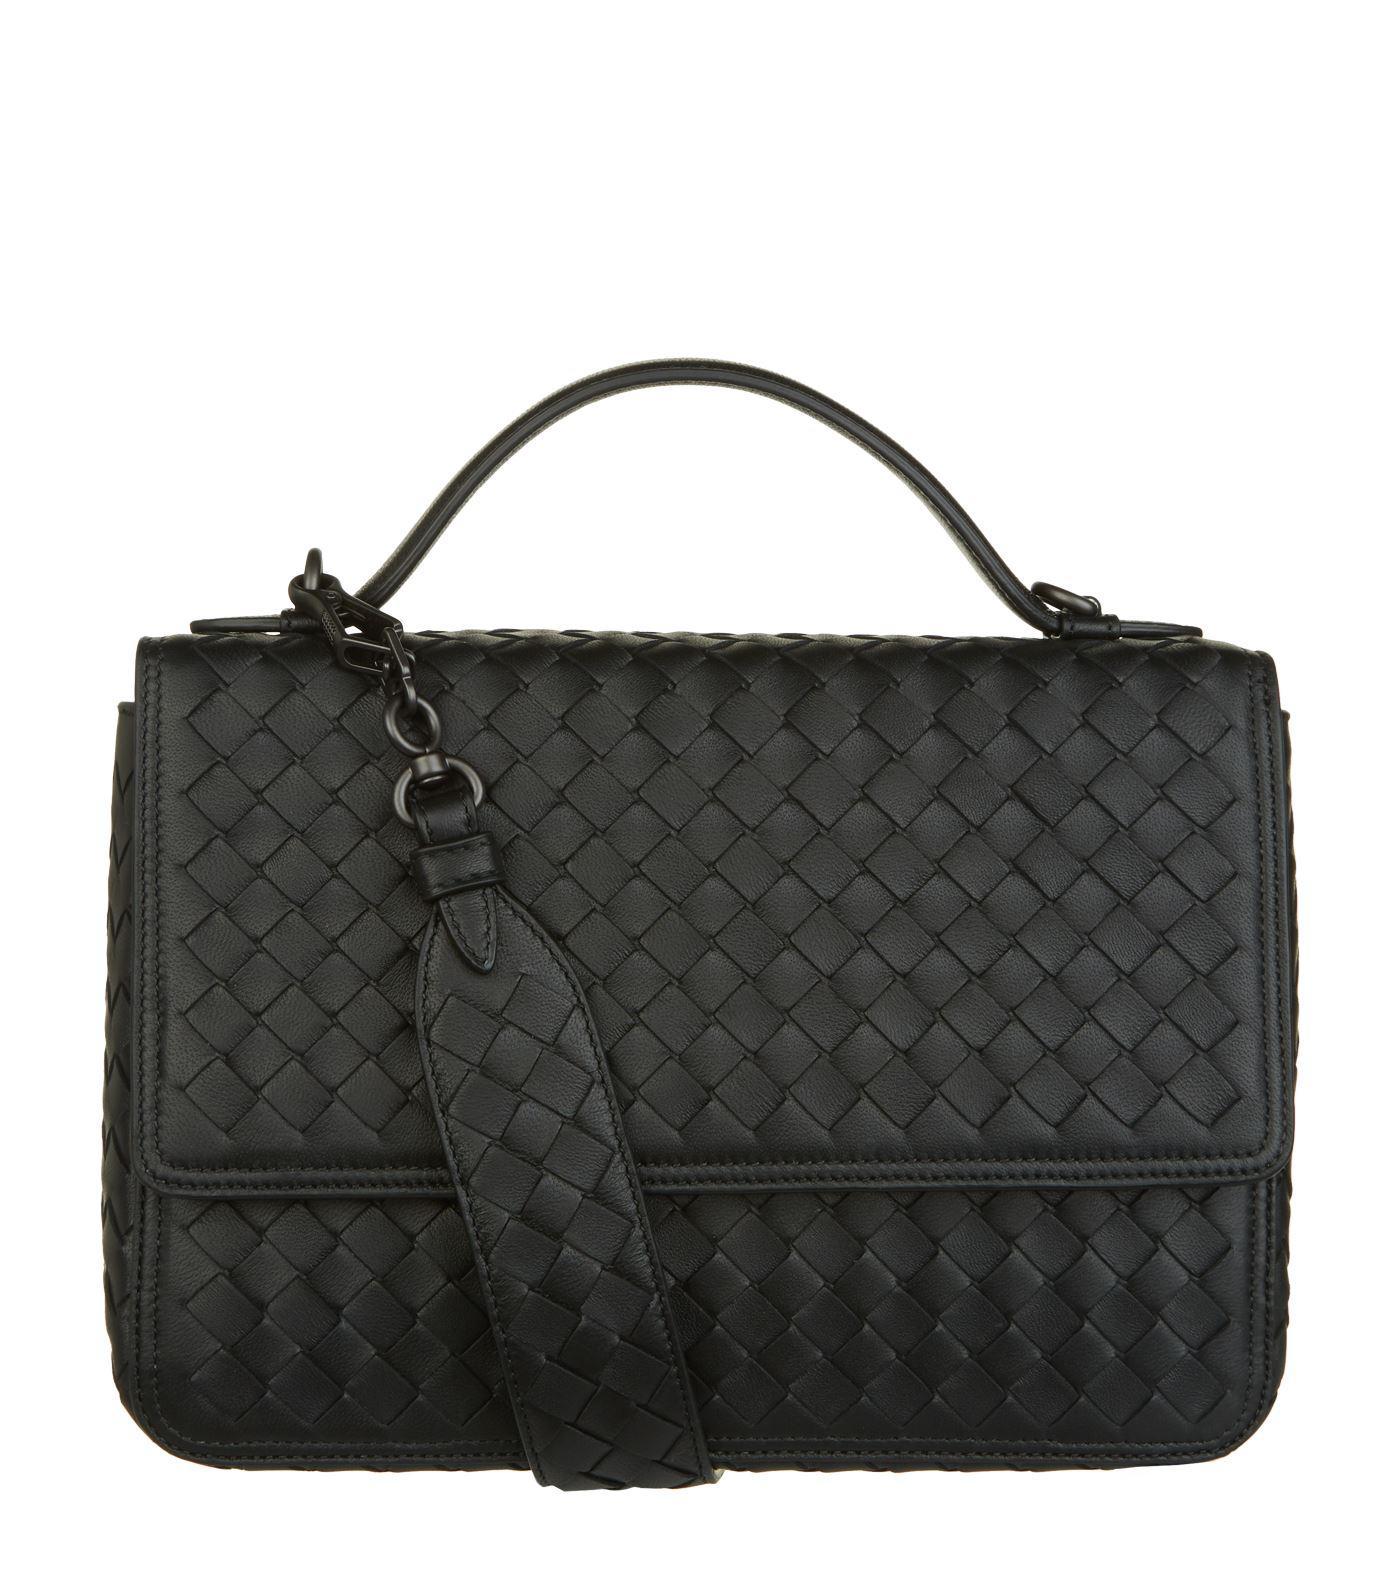 Lyst - Bottega Veneta Leather Alumna Shoulder Bag in Black 4383cf2516